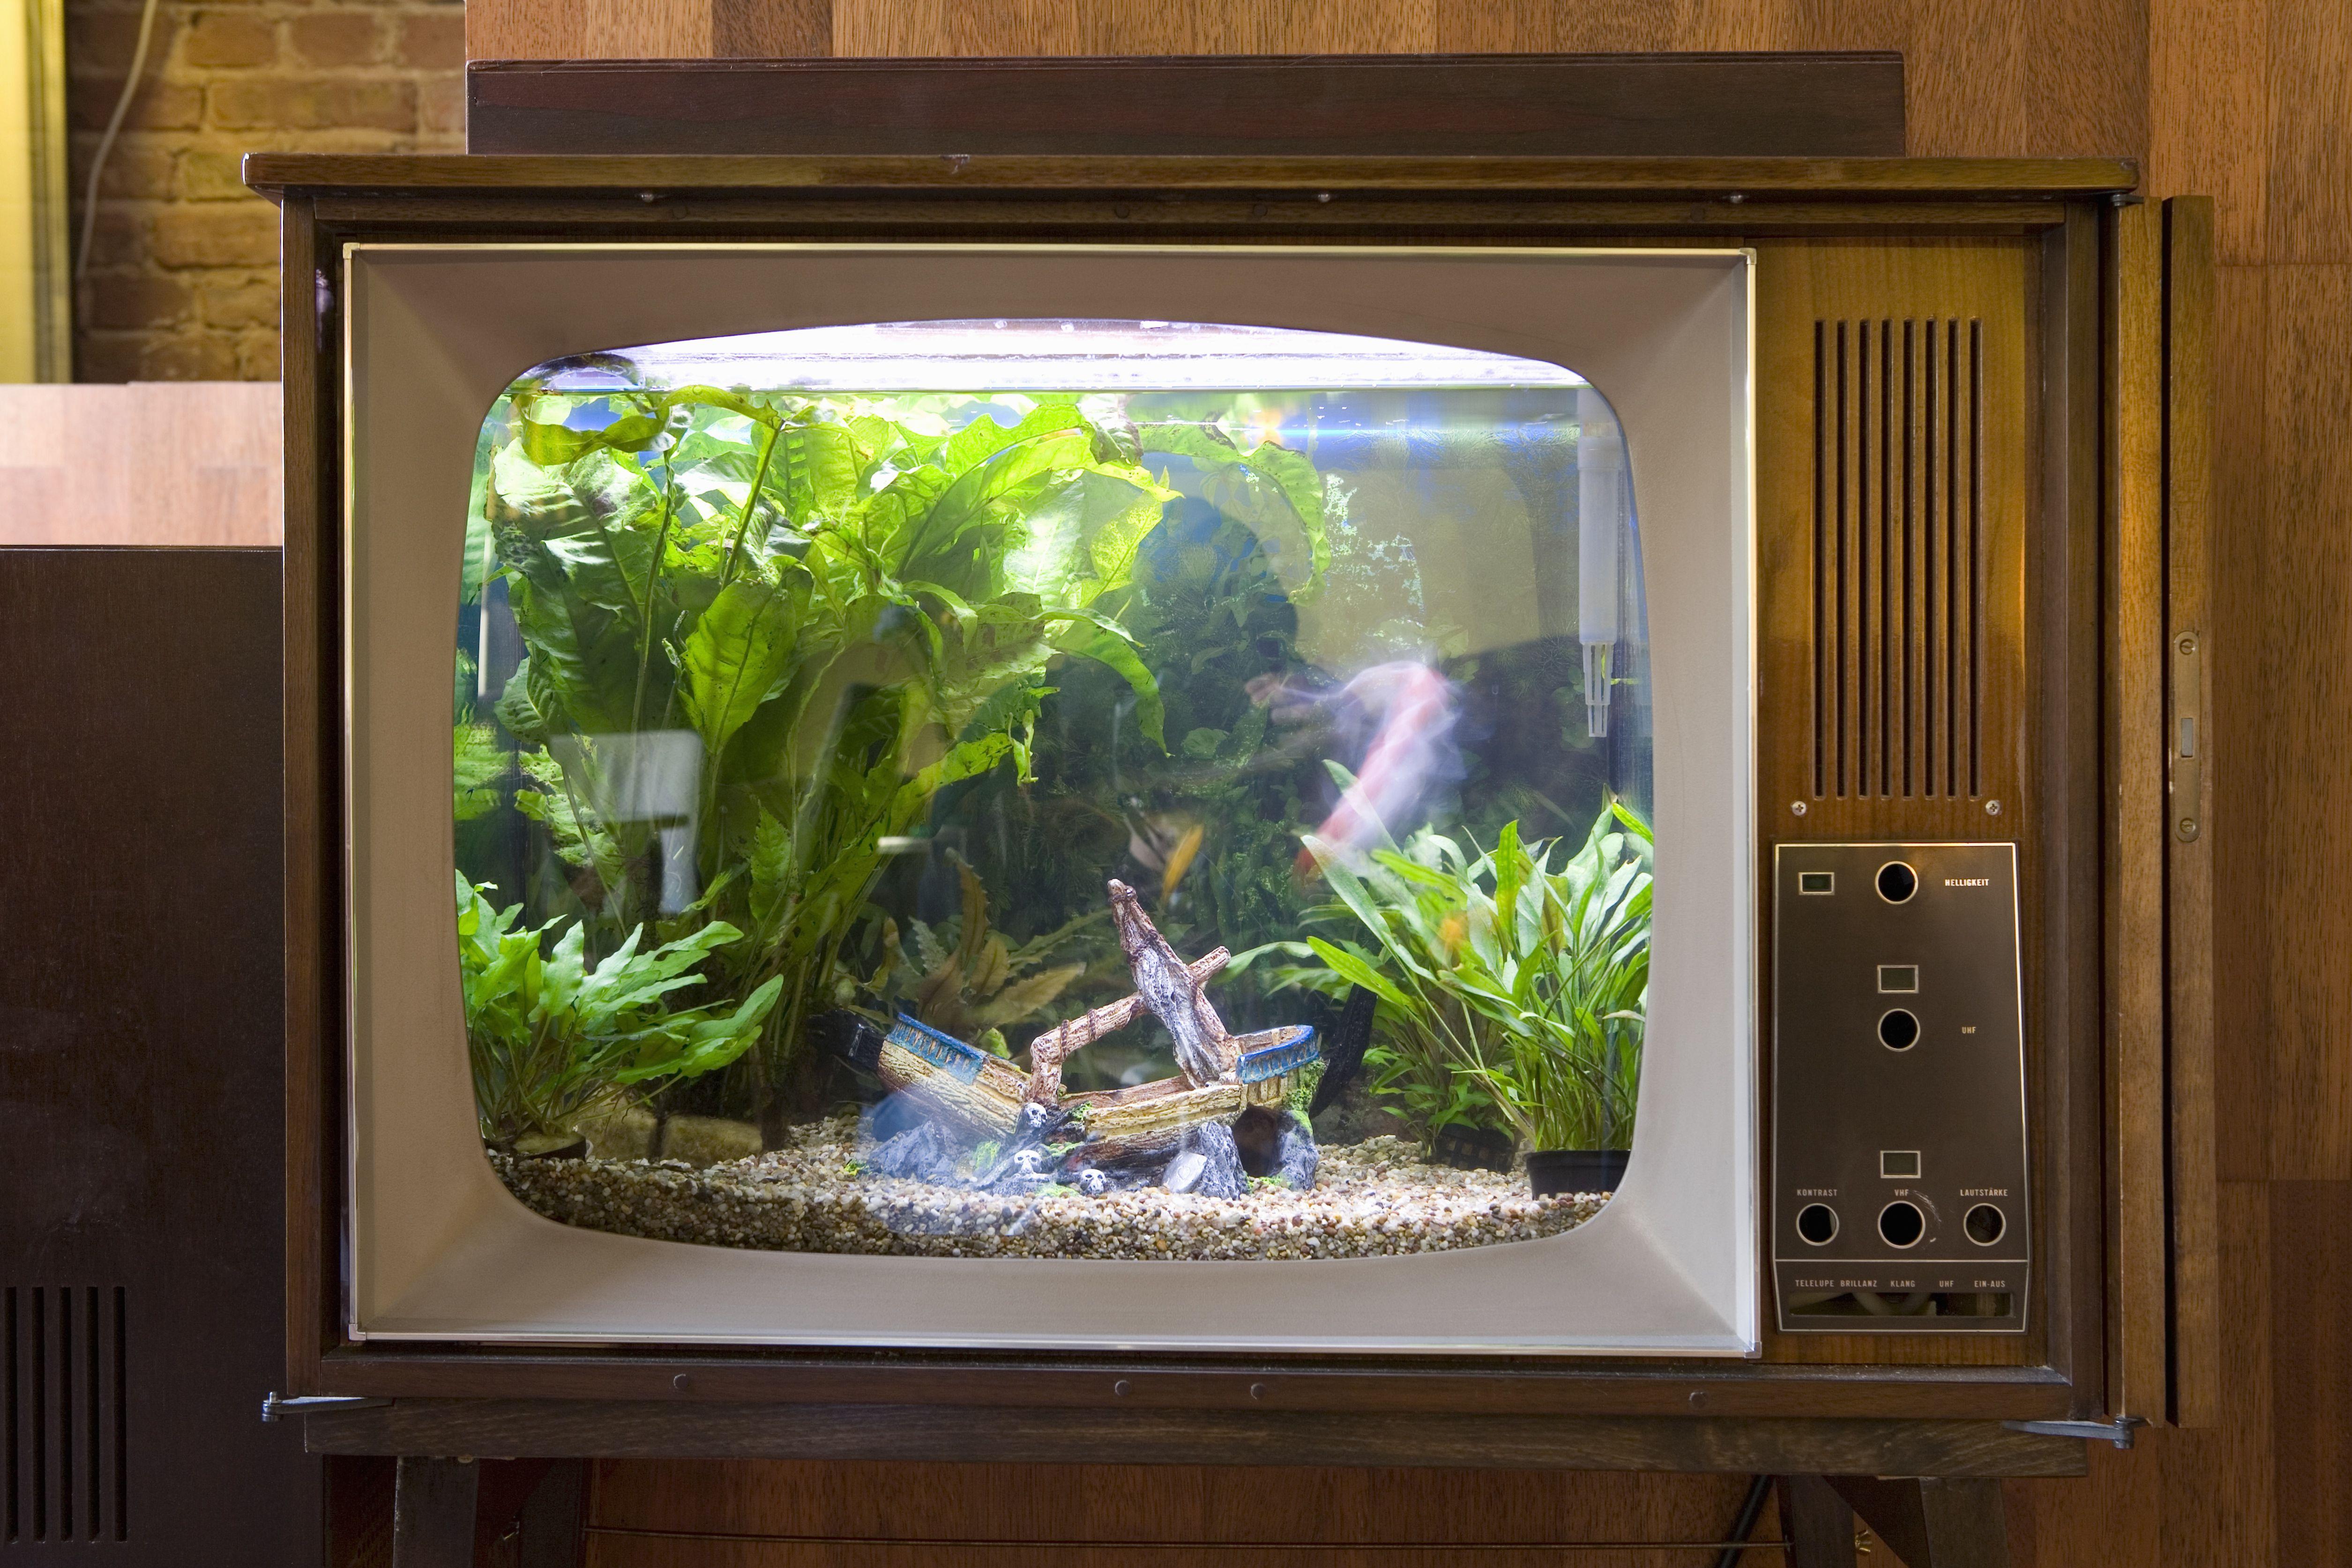 Health Benefits of Keeping an Aquarium